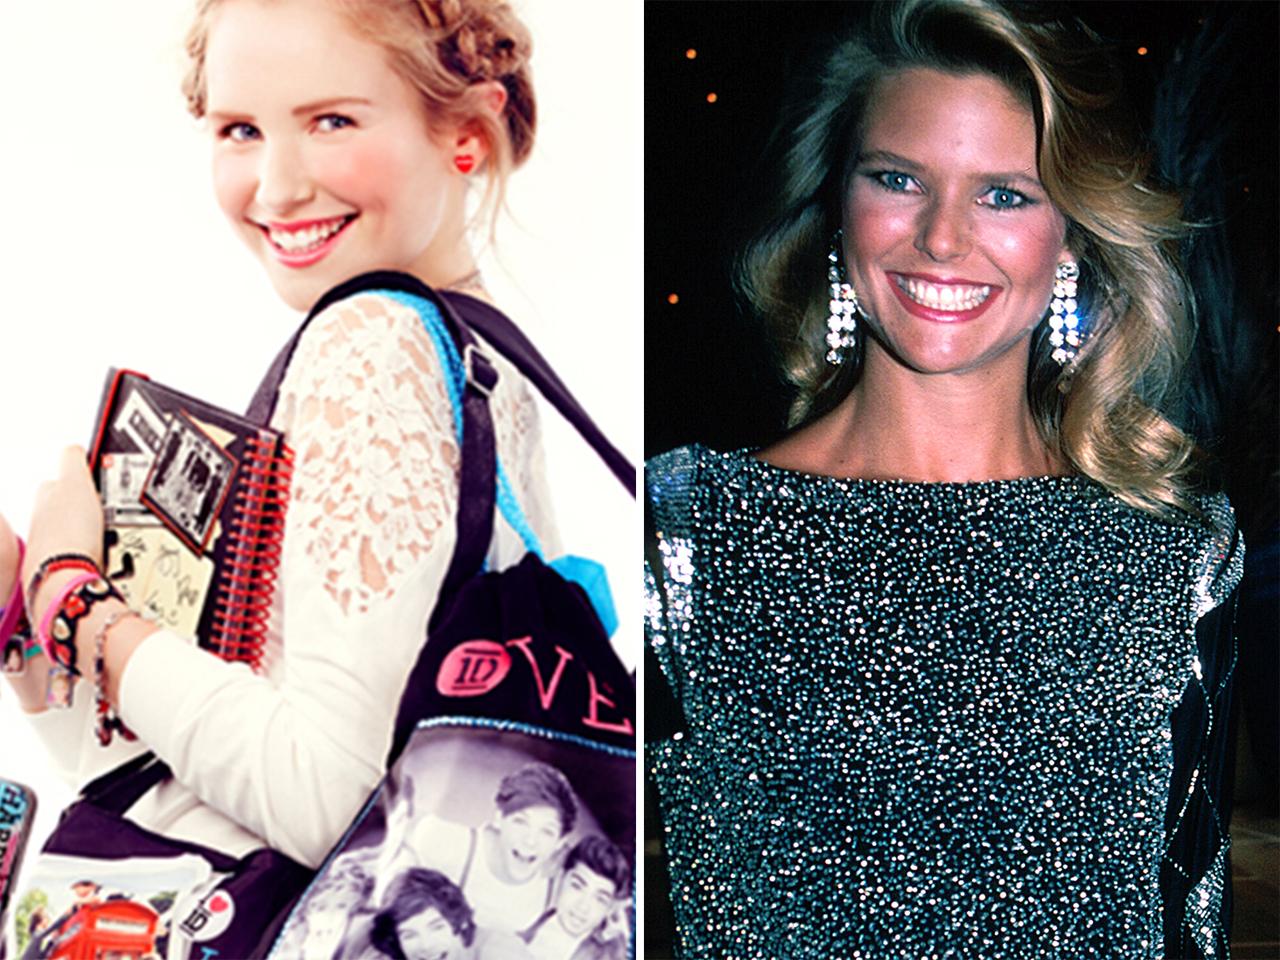 Christie Brinkley's Daughter Inherits The Modeling Bug